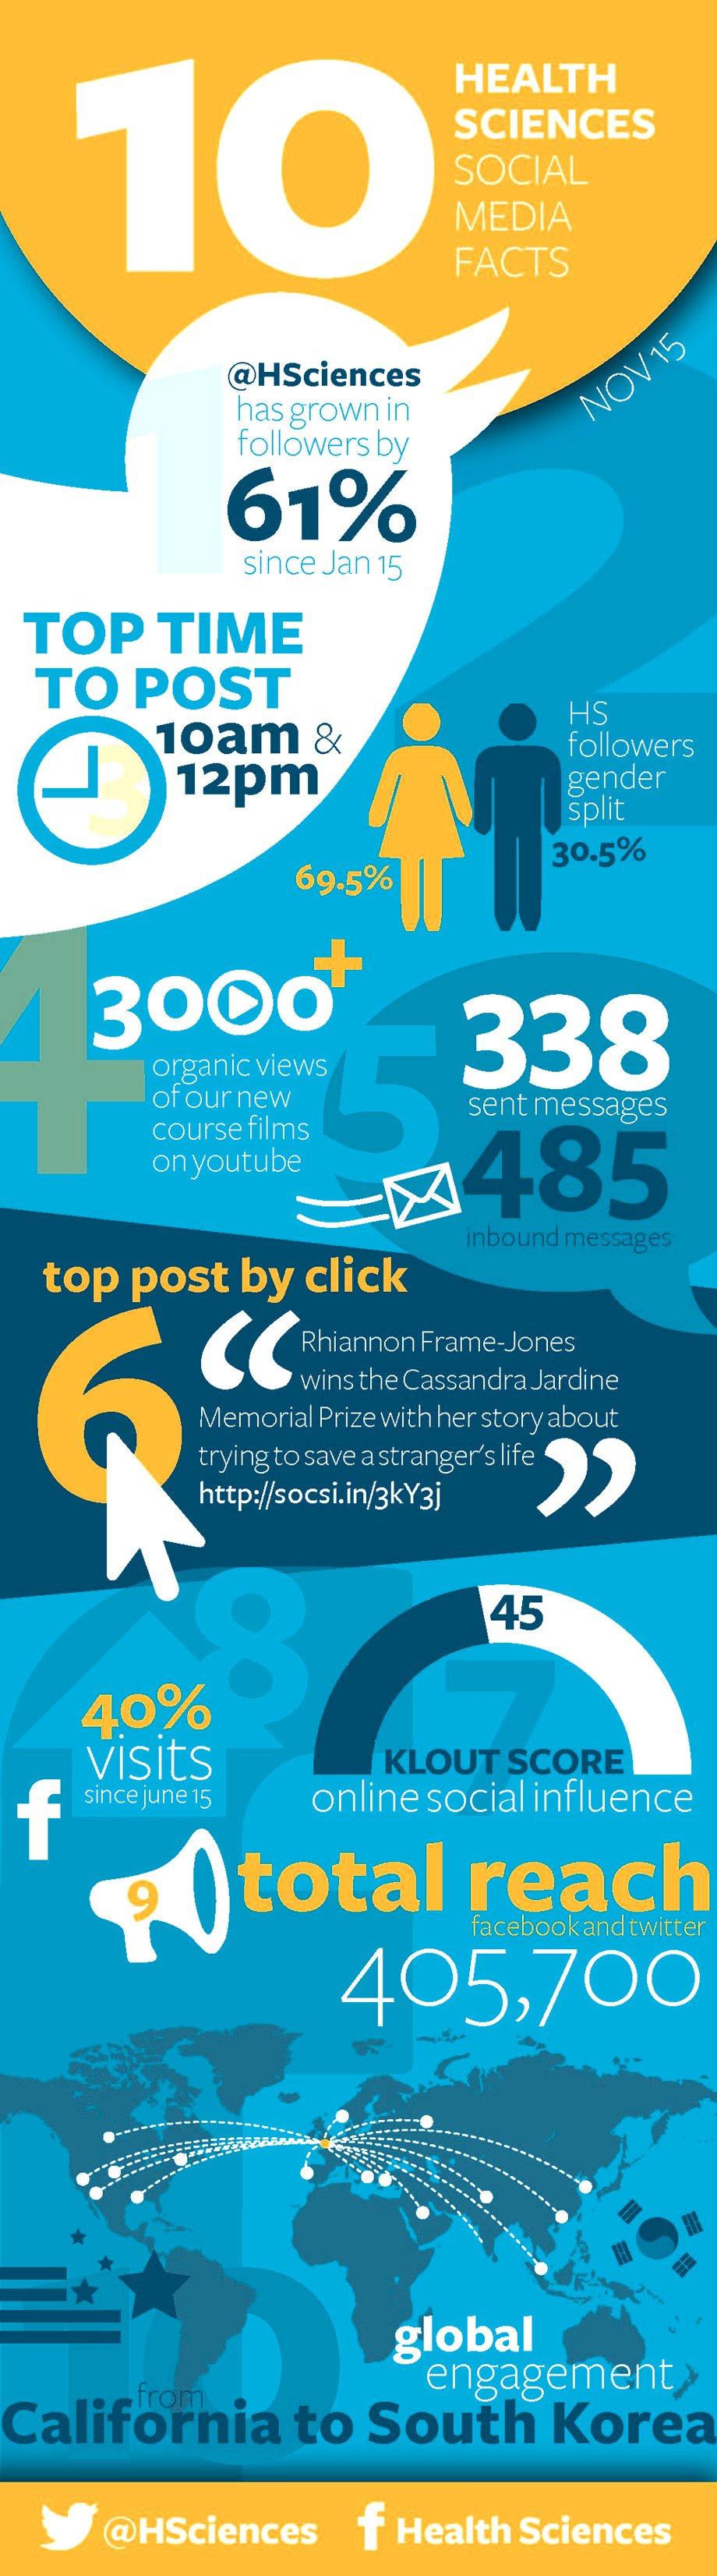 Health Sciences social media facts